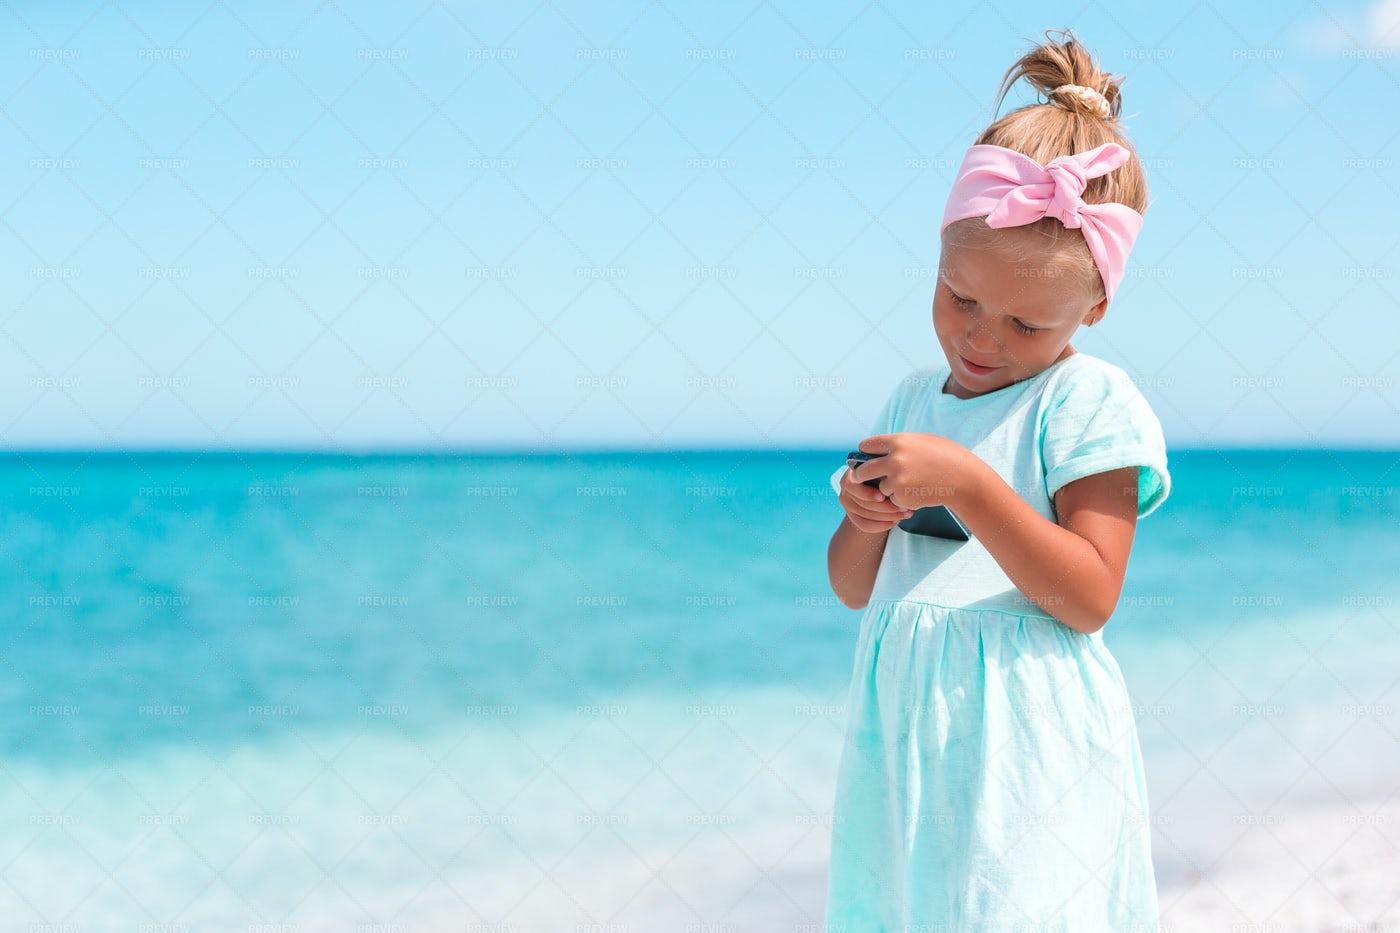 Smartphone On The Beach: Stock Photos